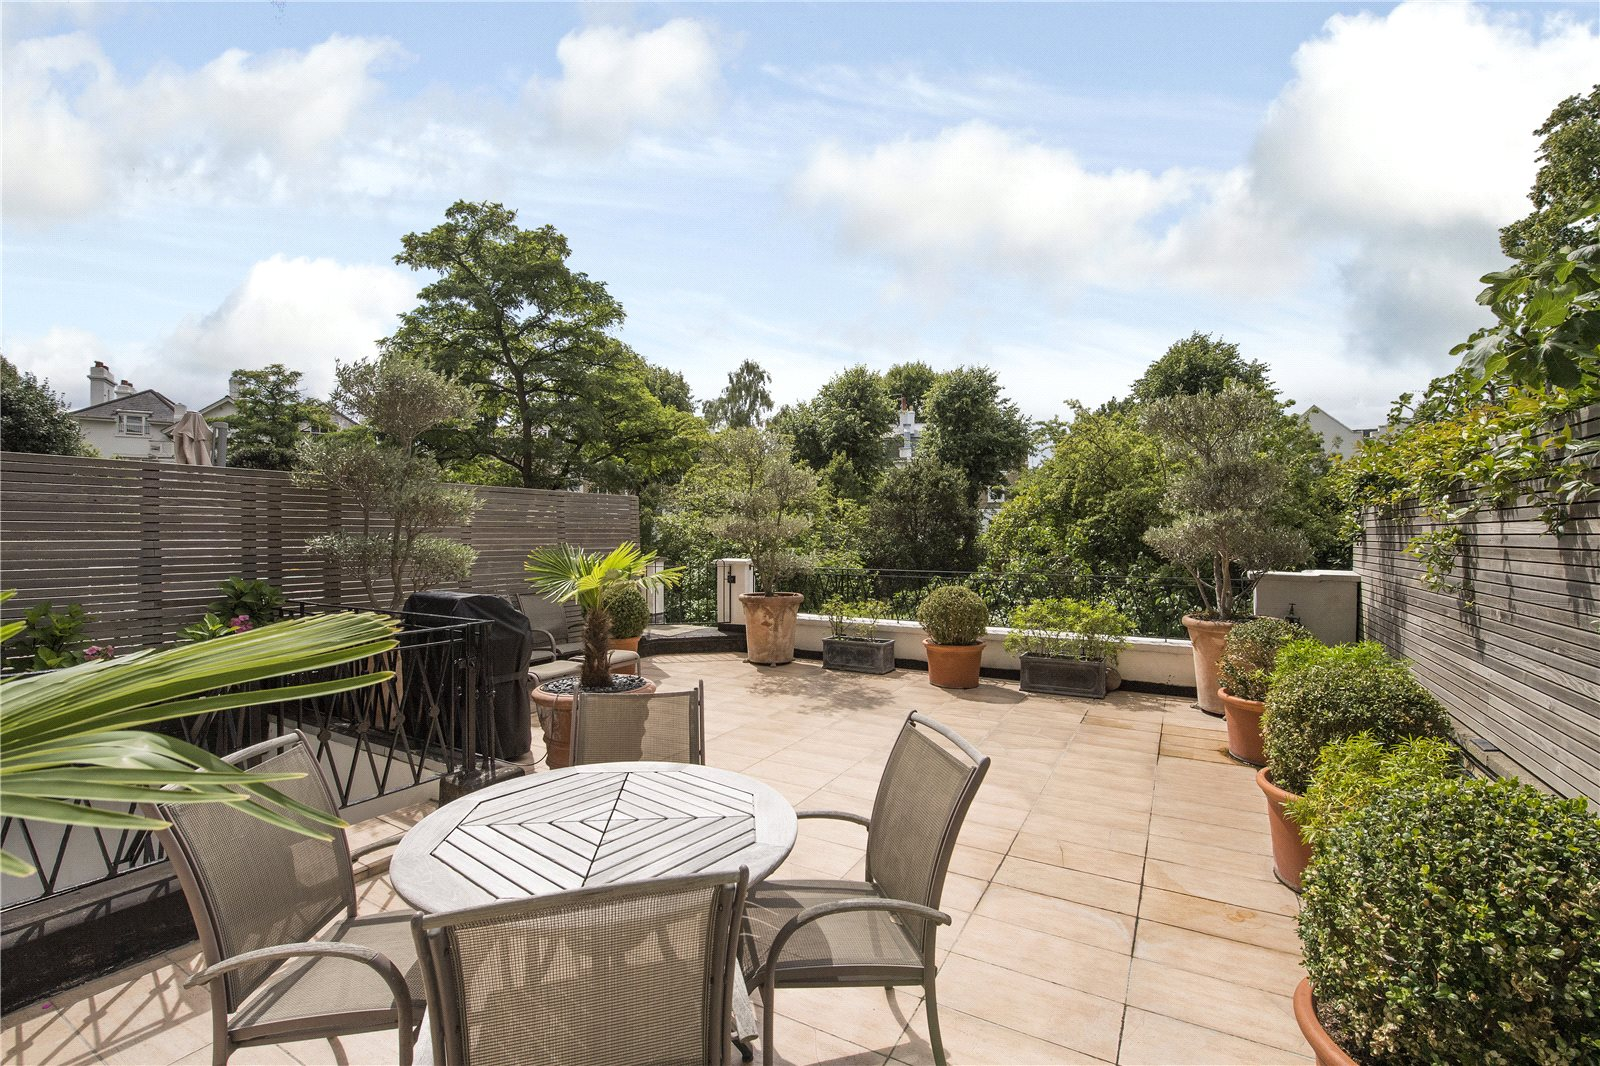 公寓 為 出售 在 Ladbroke Grove, Notting Hill, London, W11 Notting Hill, London, 英格蘭